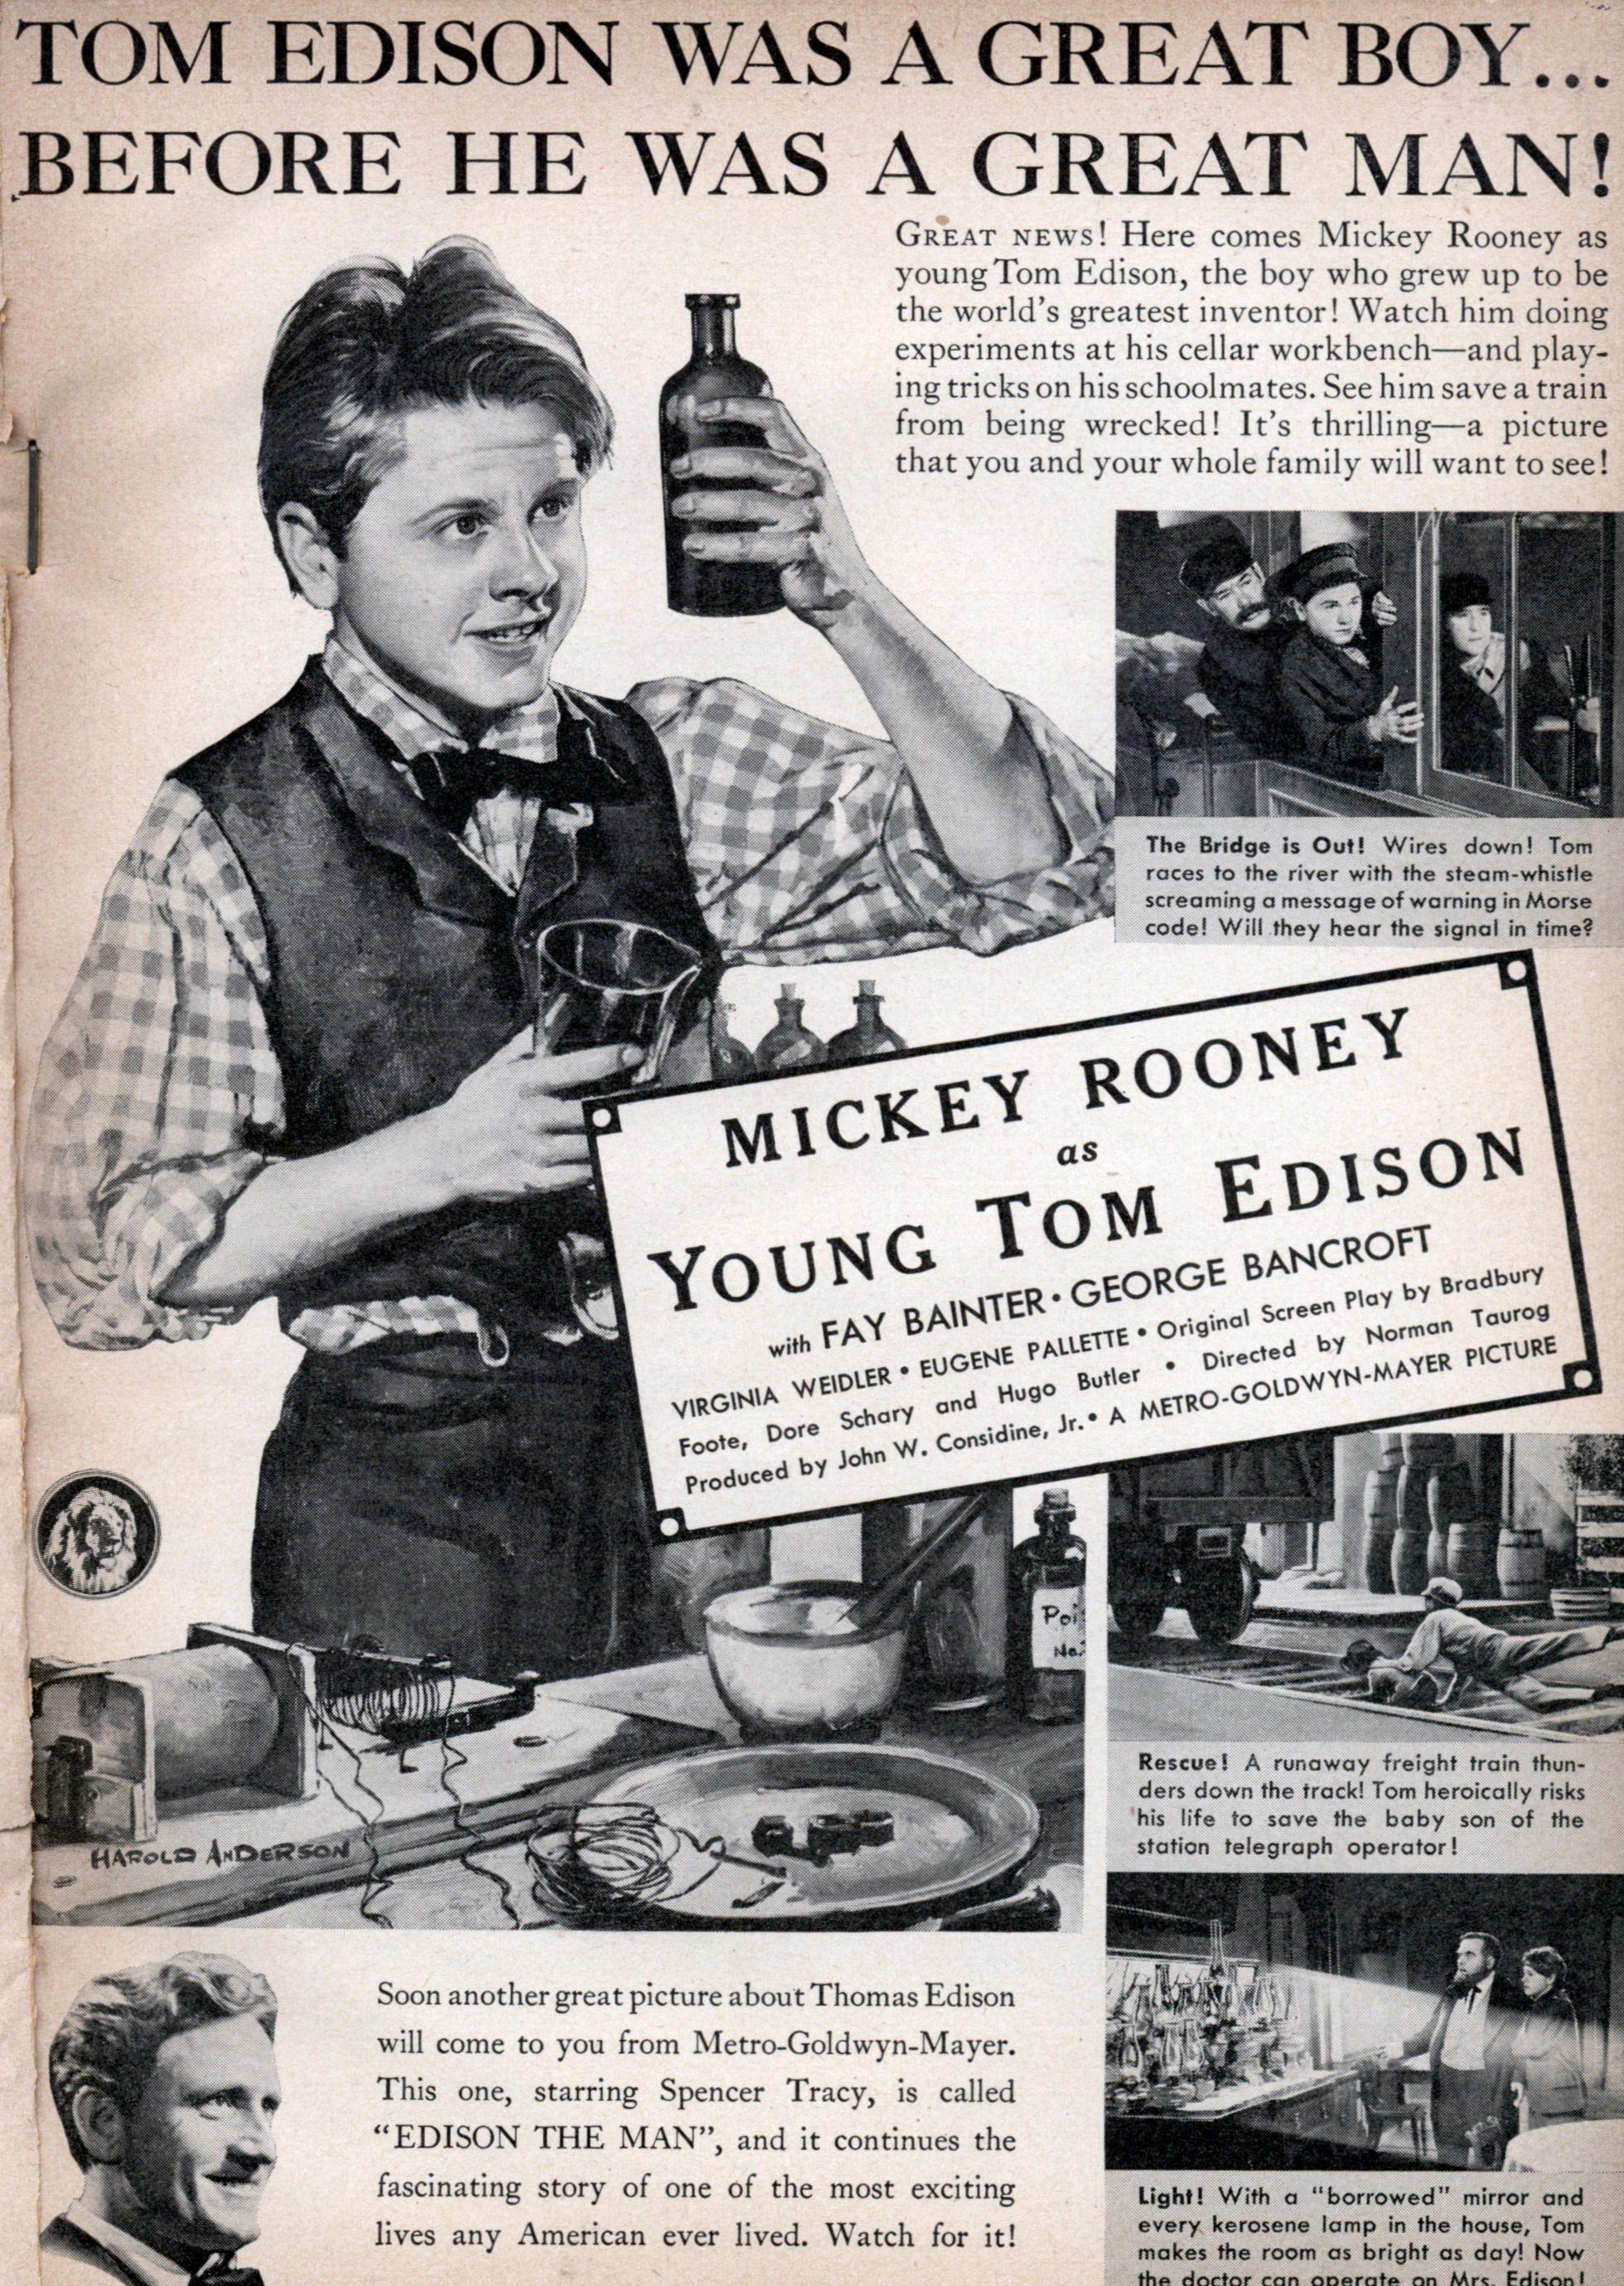 MICKEY ROONEY as Young Tom Edison | Modern Mechanix